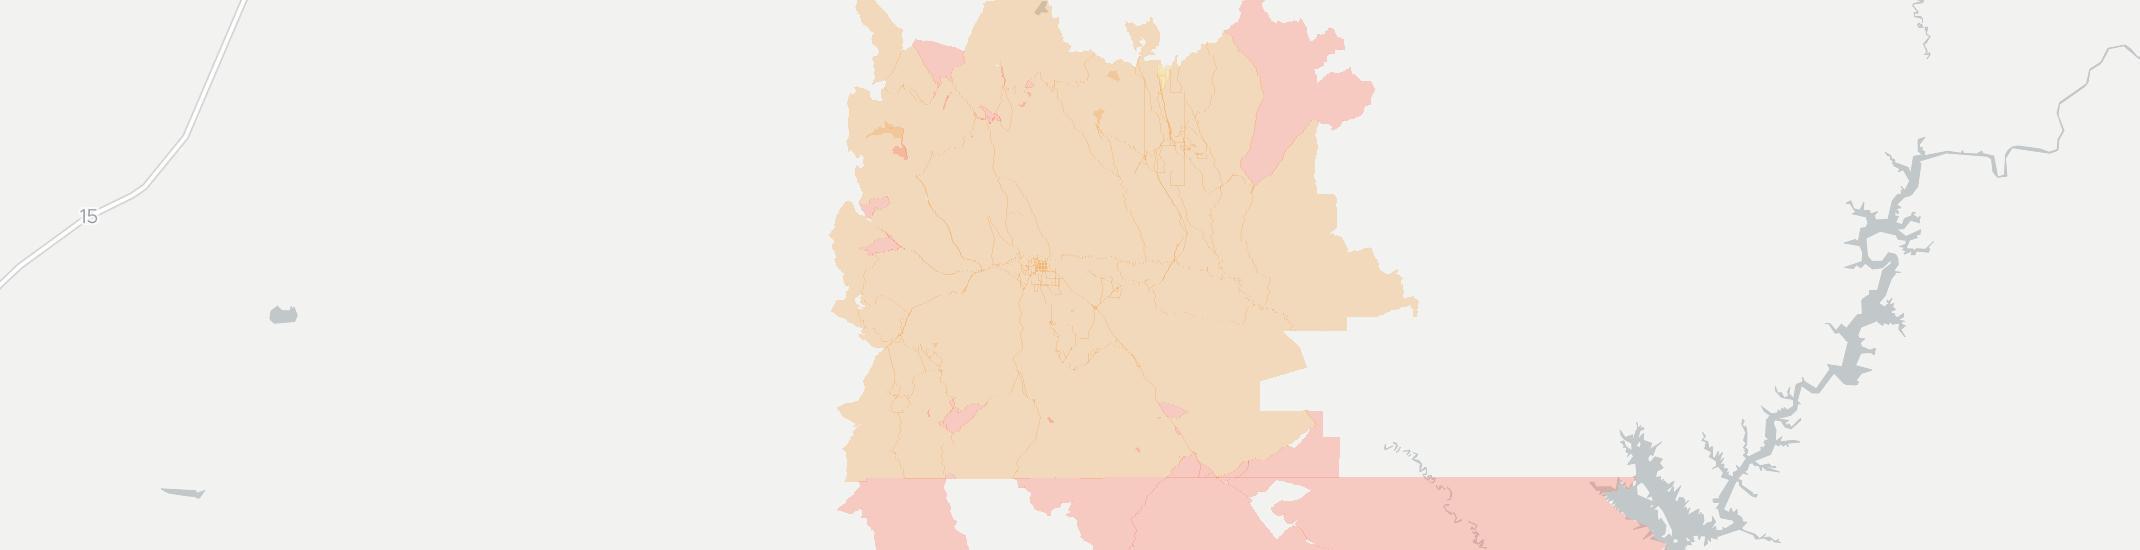 Escalante Internet Competition Map. Click for interactive map.